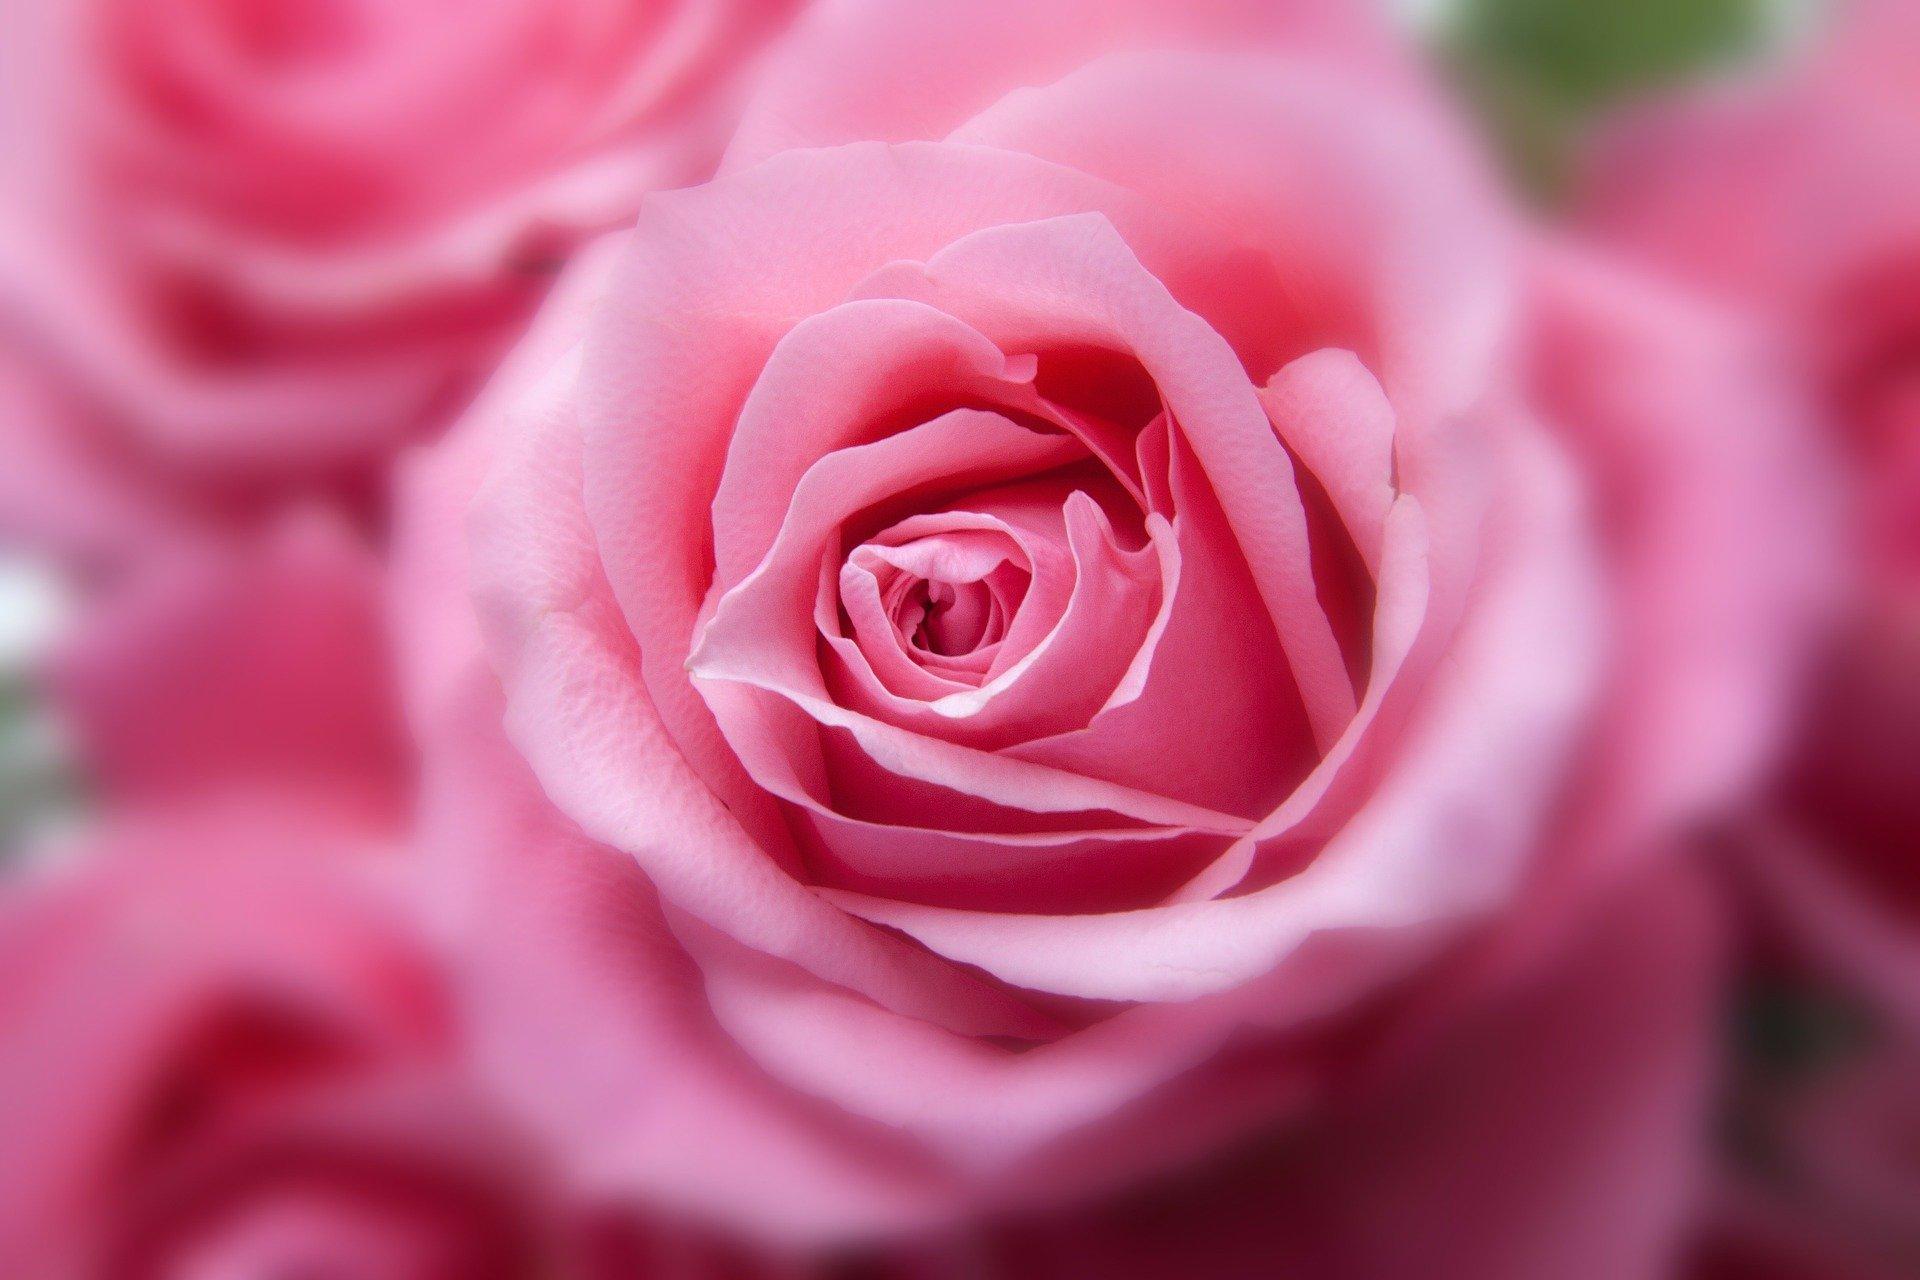 Ce ganduri poti sa transmiti atunci cand oferi trandafiri roz?